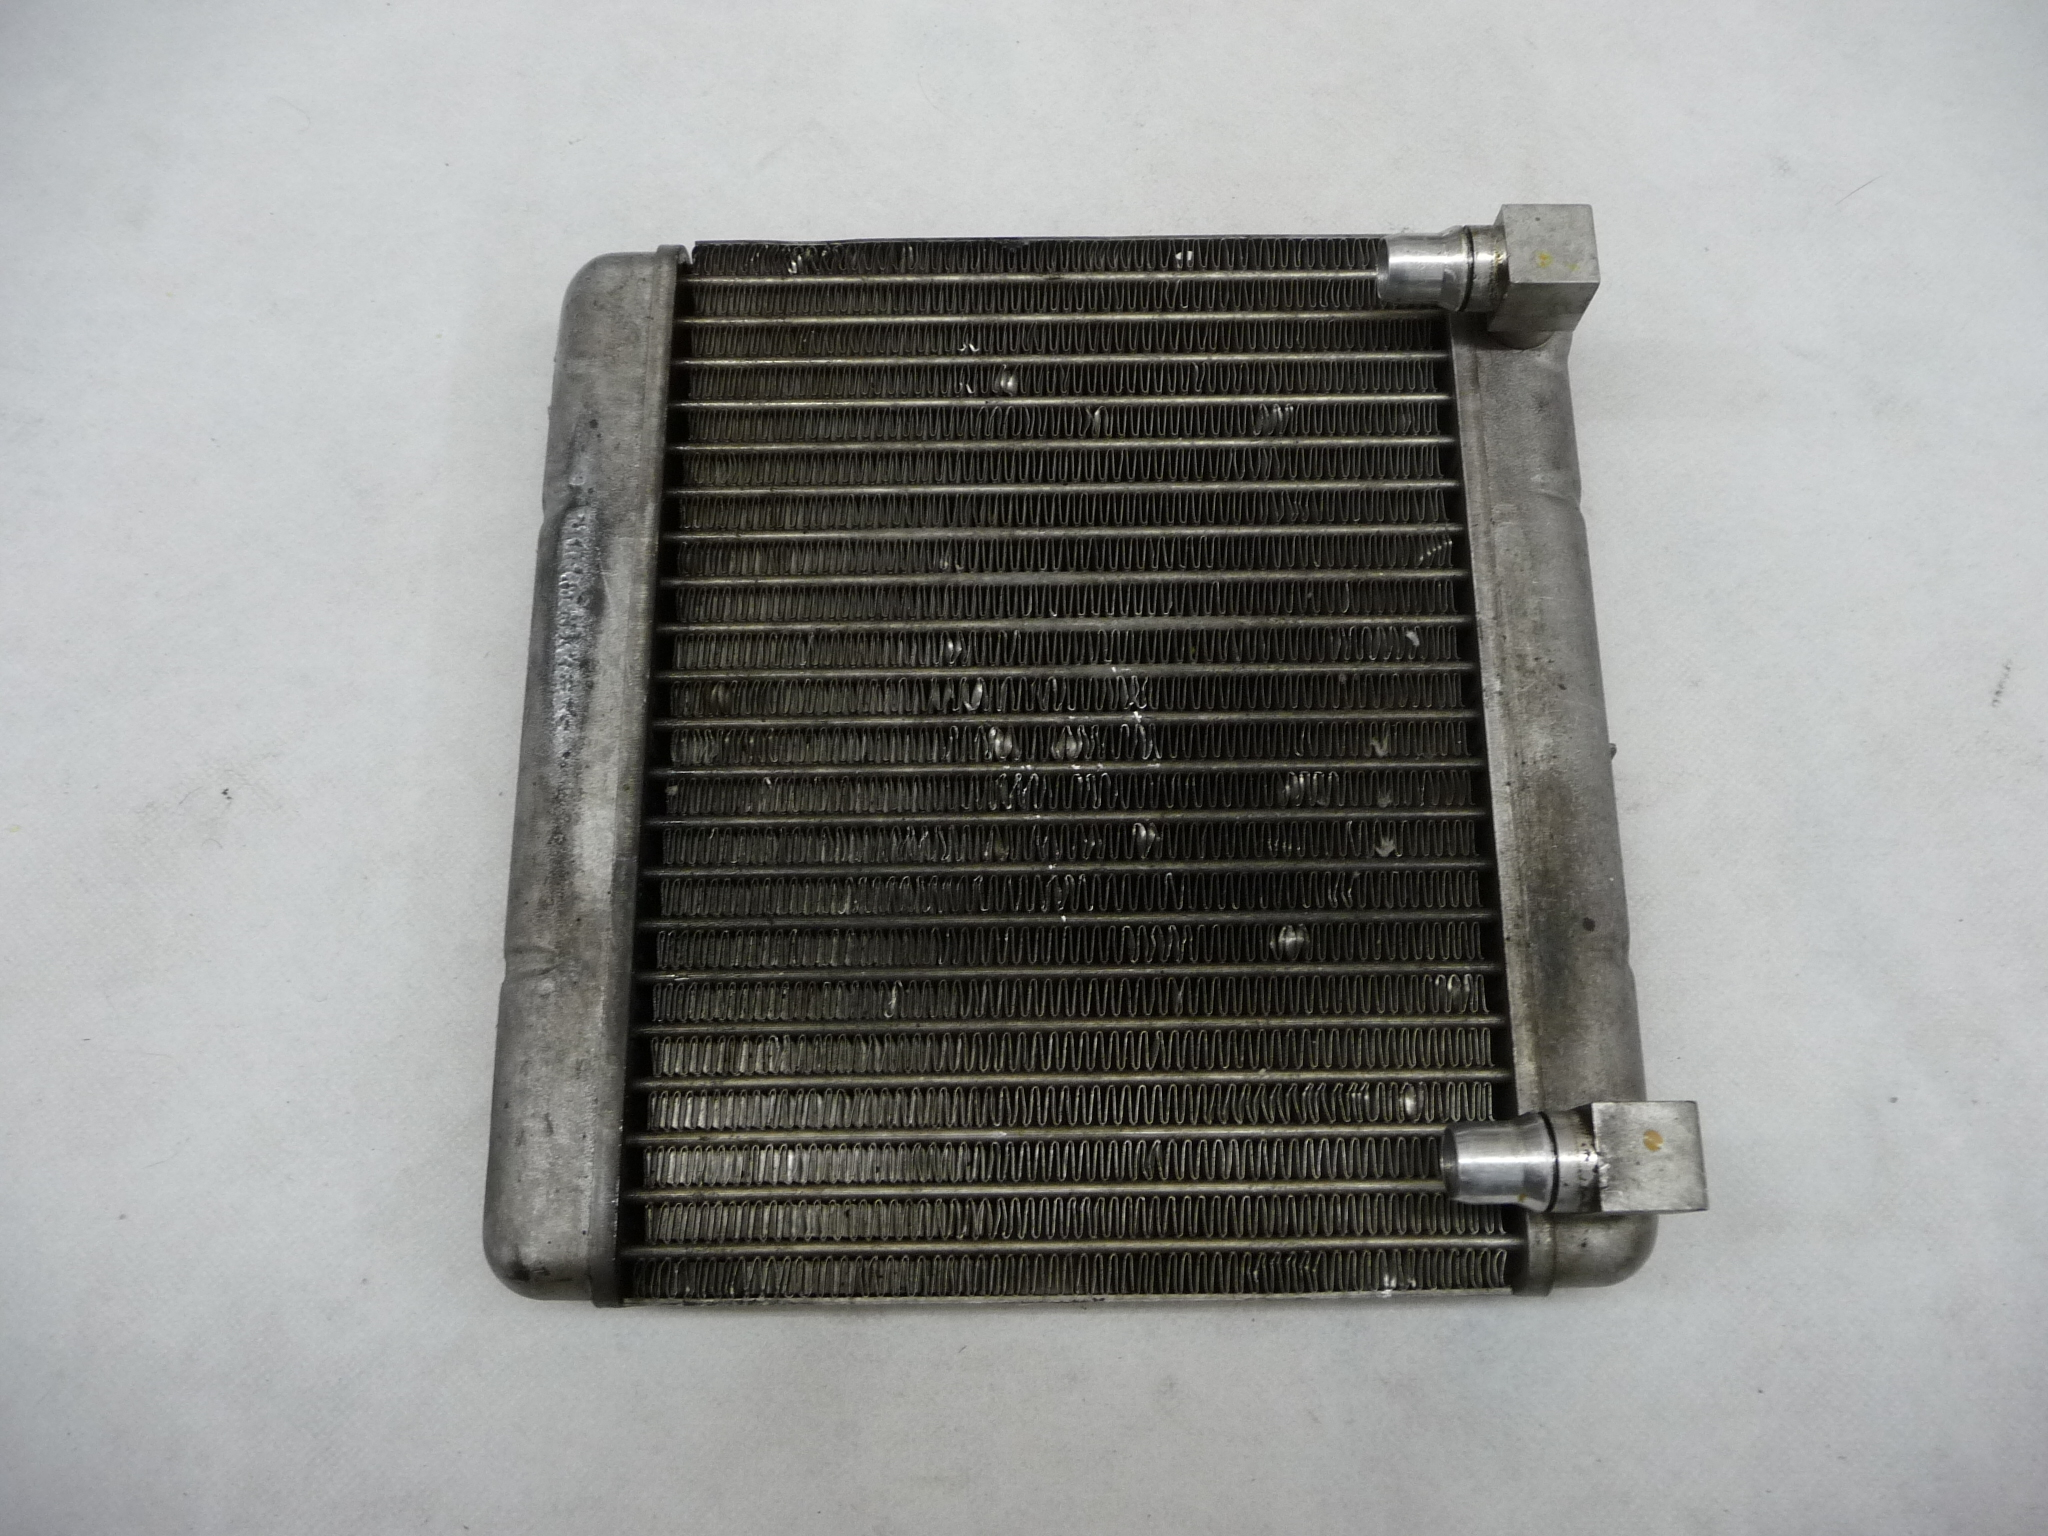 2009 2010 2011 2012 2013 2014 2015 2016 2017 BMW F01 F02 750i 750Li Engine Oil Cooler Radiator 17217570103 OEM OE